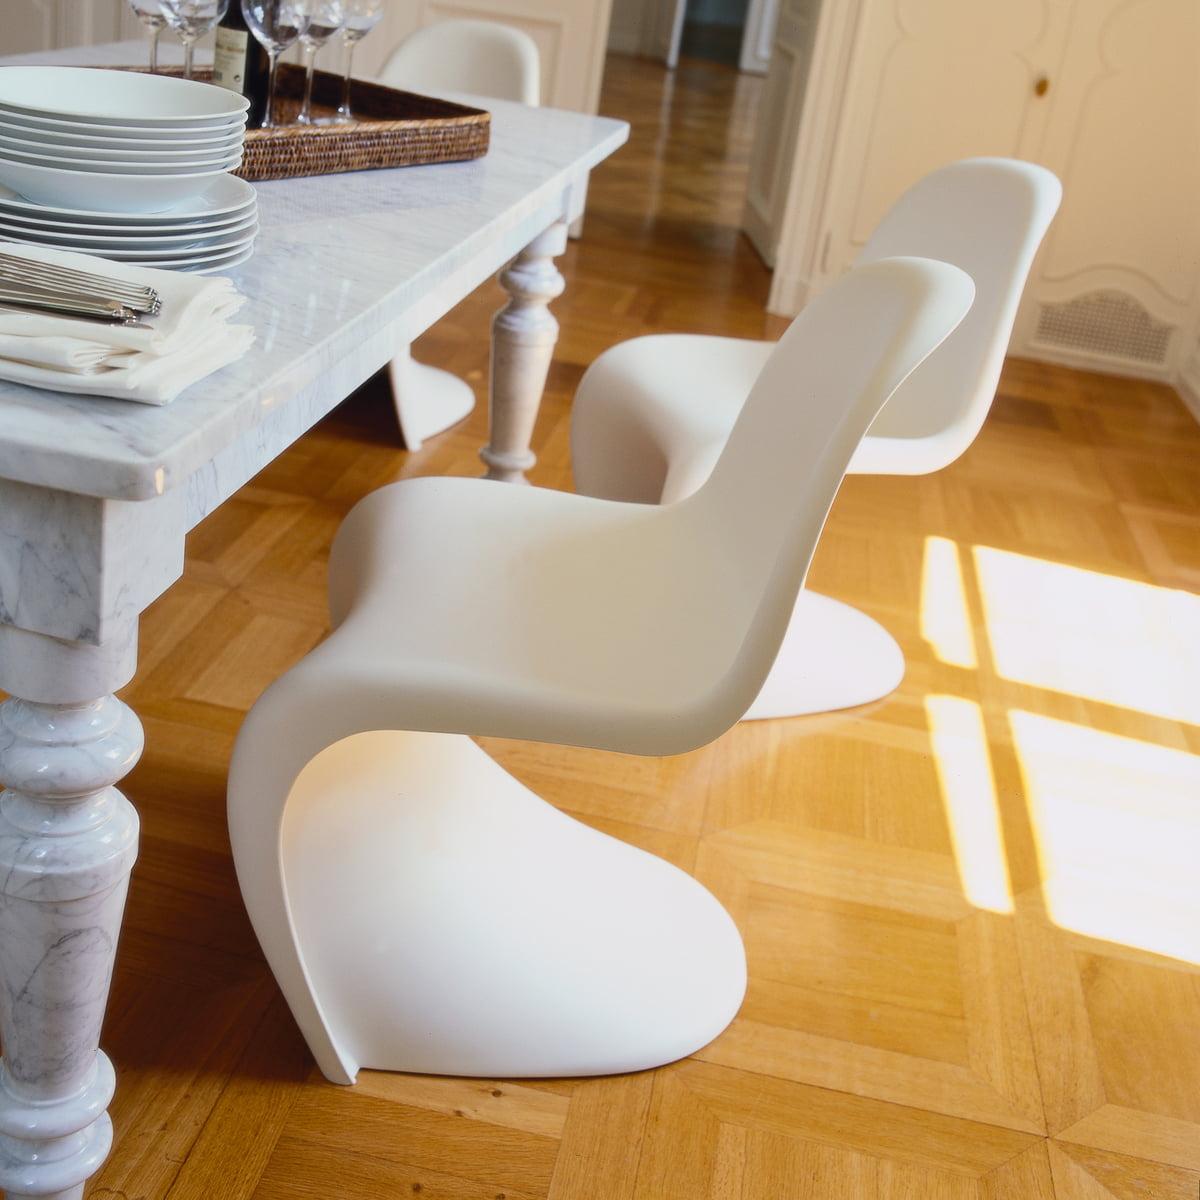 Panton chair original stuhl von vitra connox for Design stuhl panton